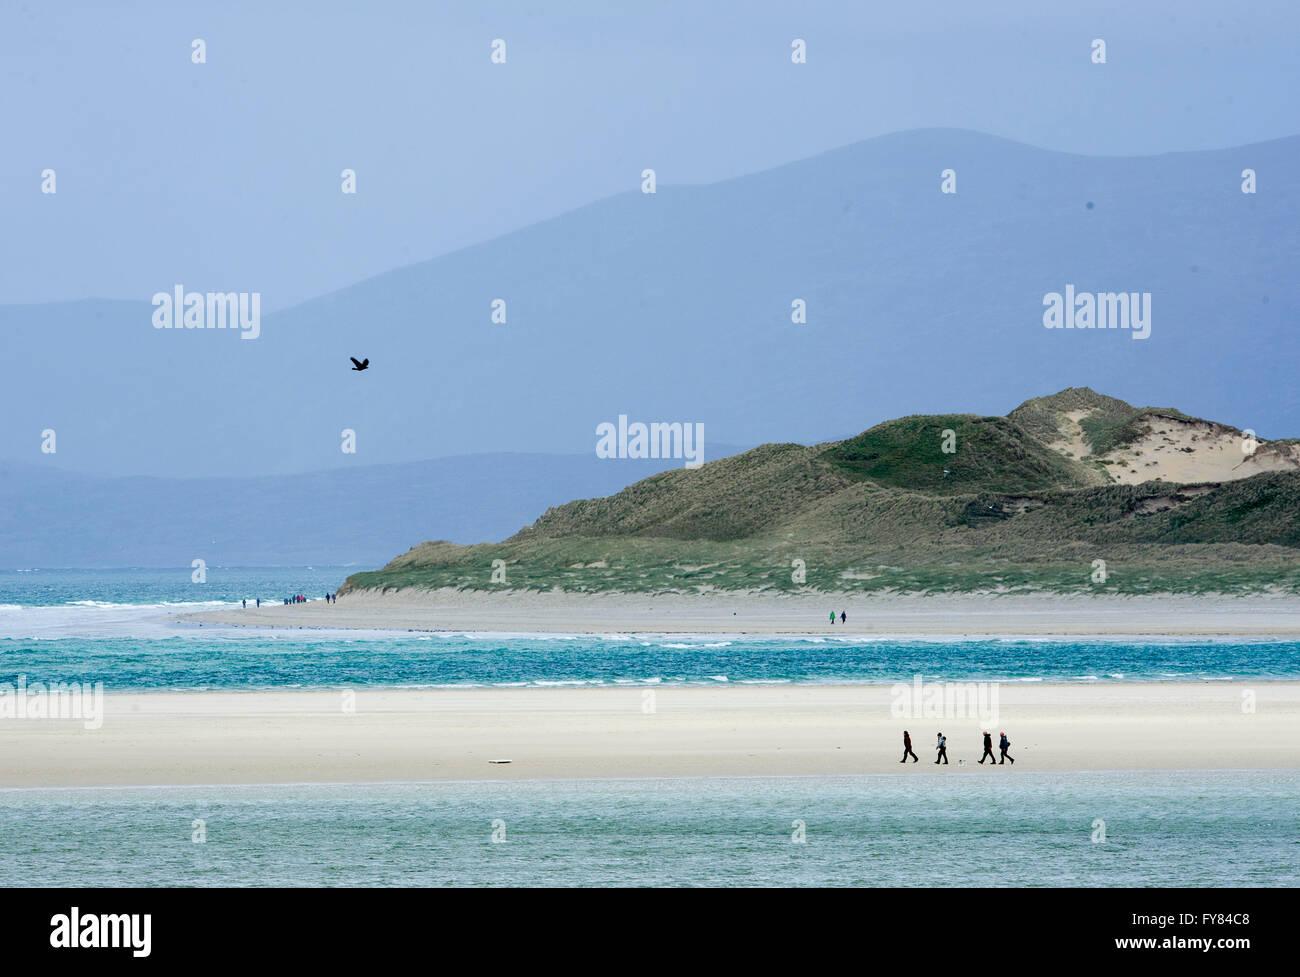 Walkers on Luskentyre beach, Isle of  Harris Scotland, UK. - Stock Image